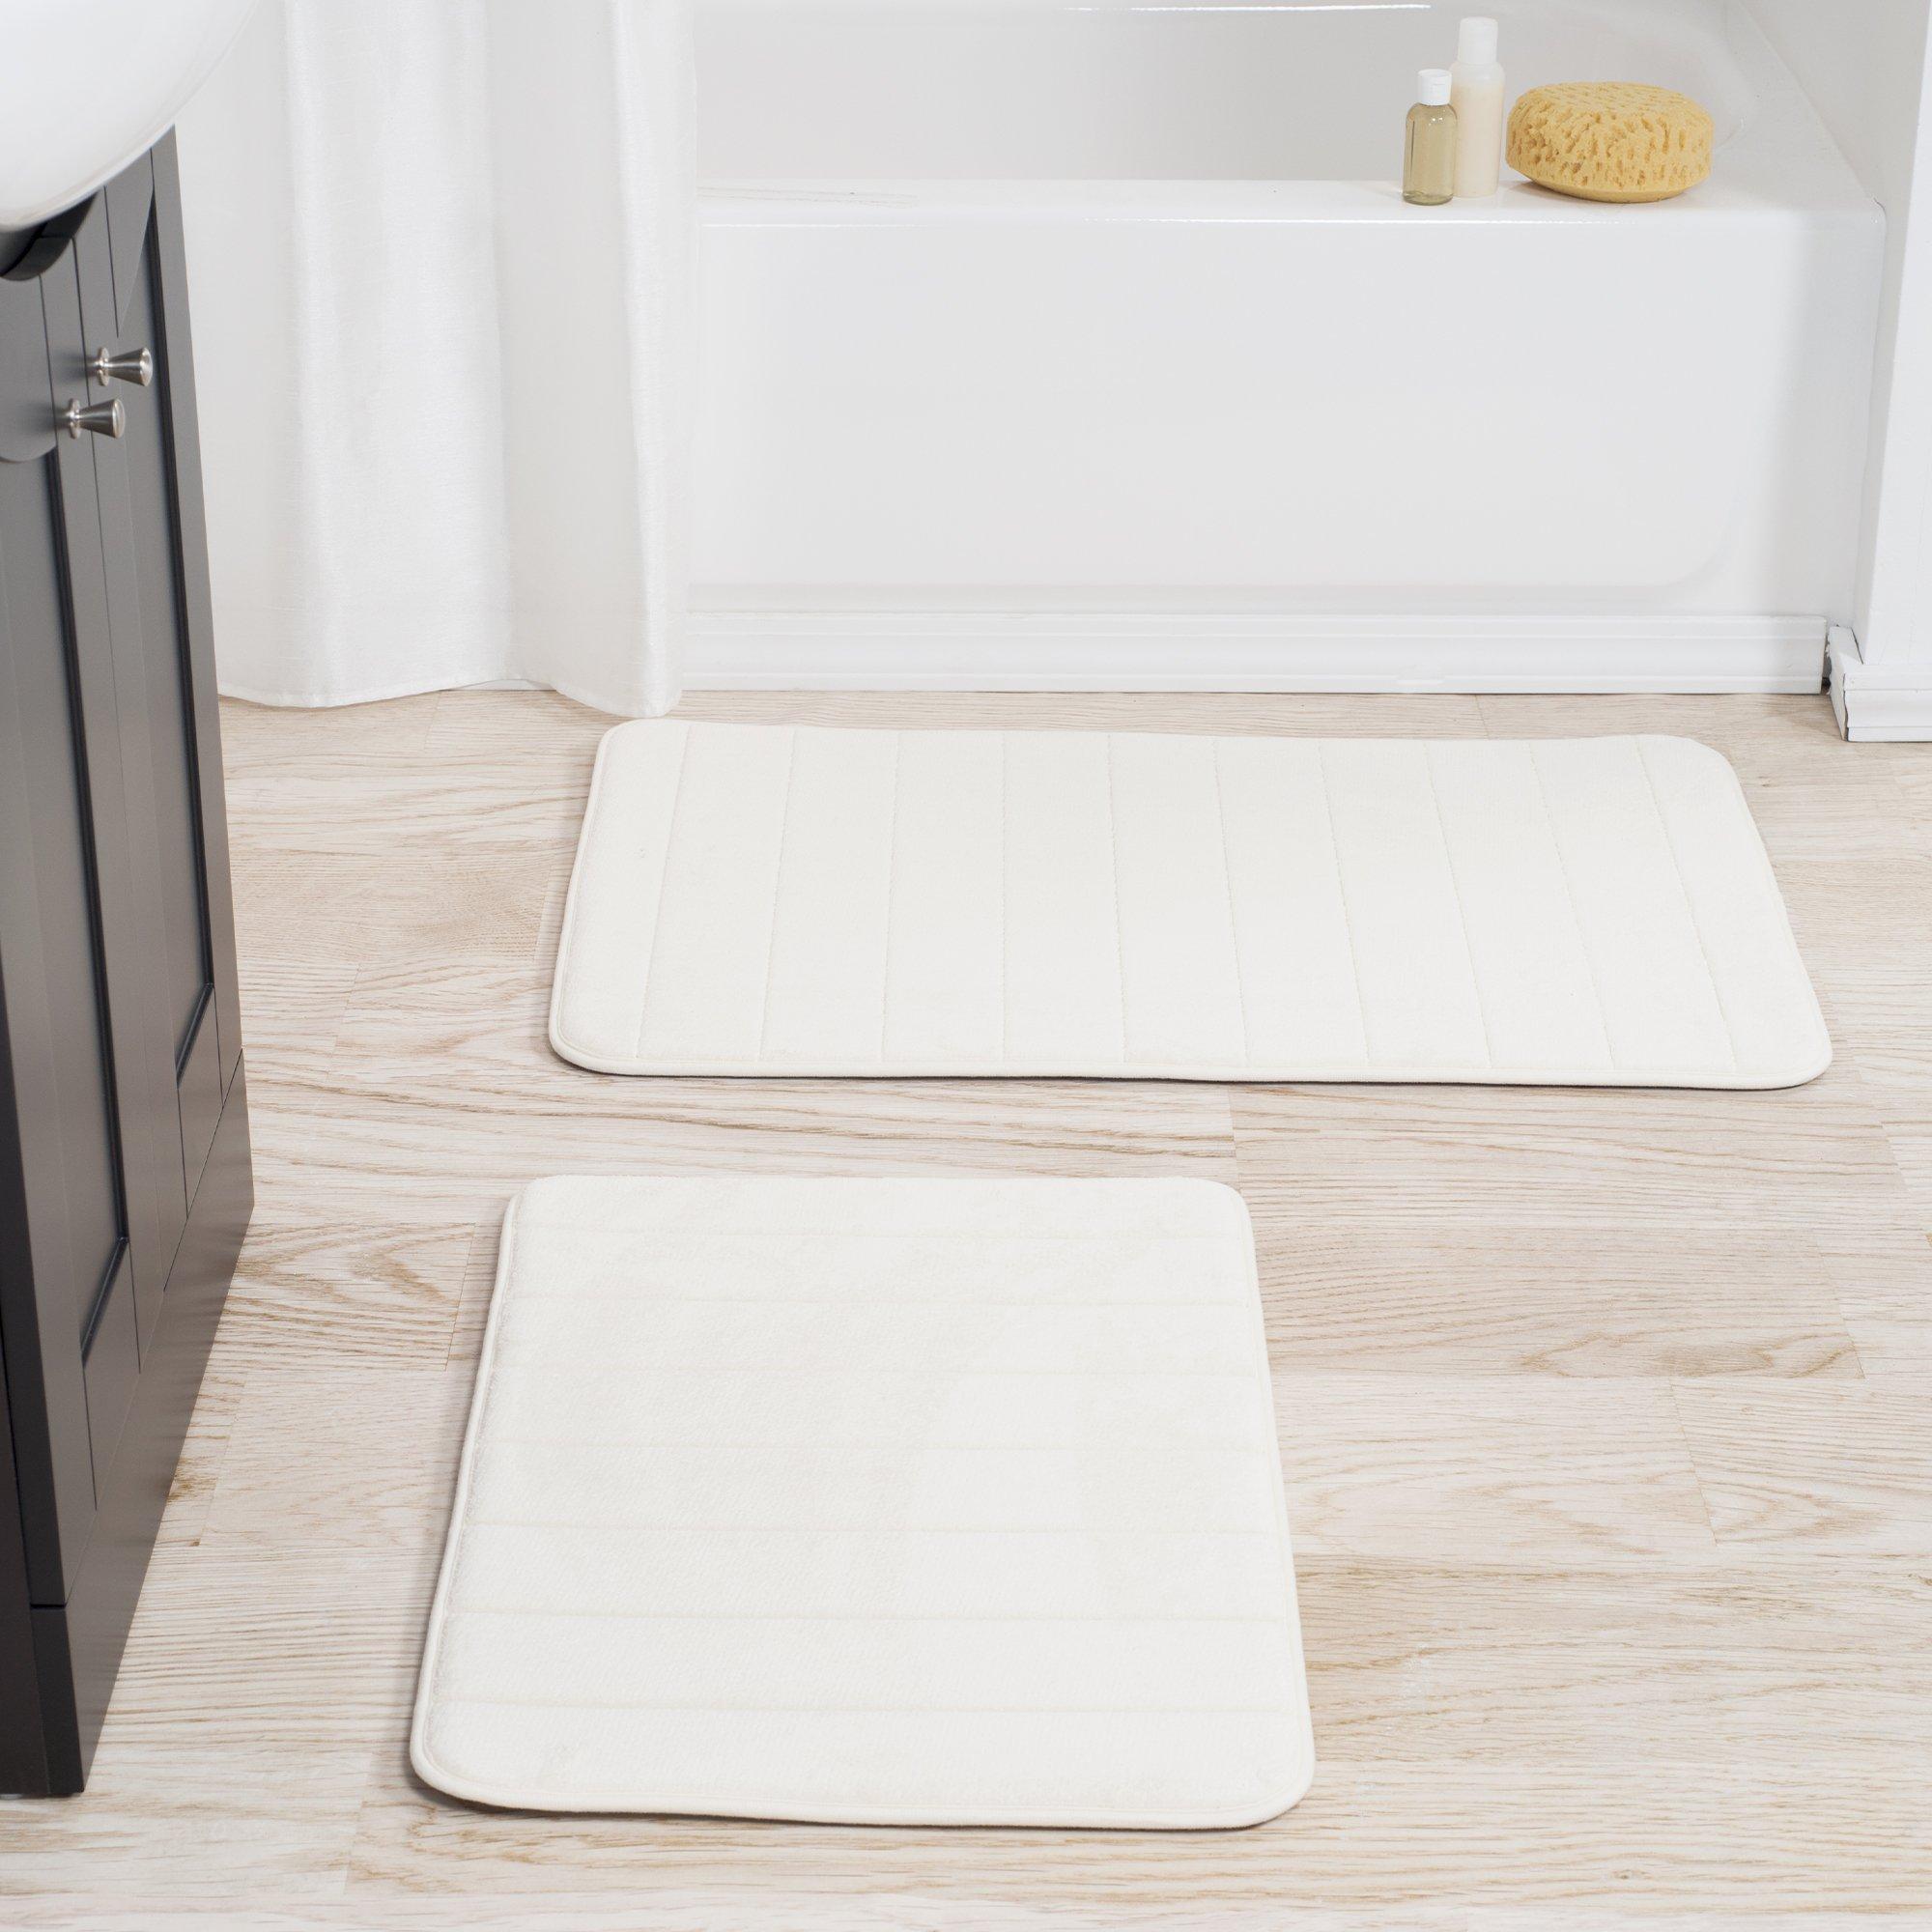 Lavish Home 2 Piece Memory Foam Striped Bath Mat, White